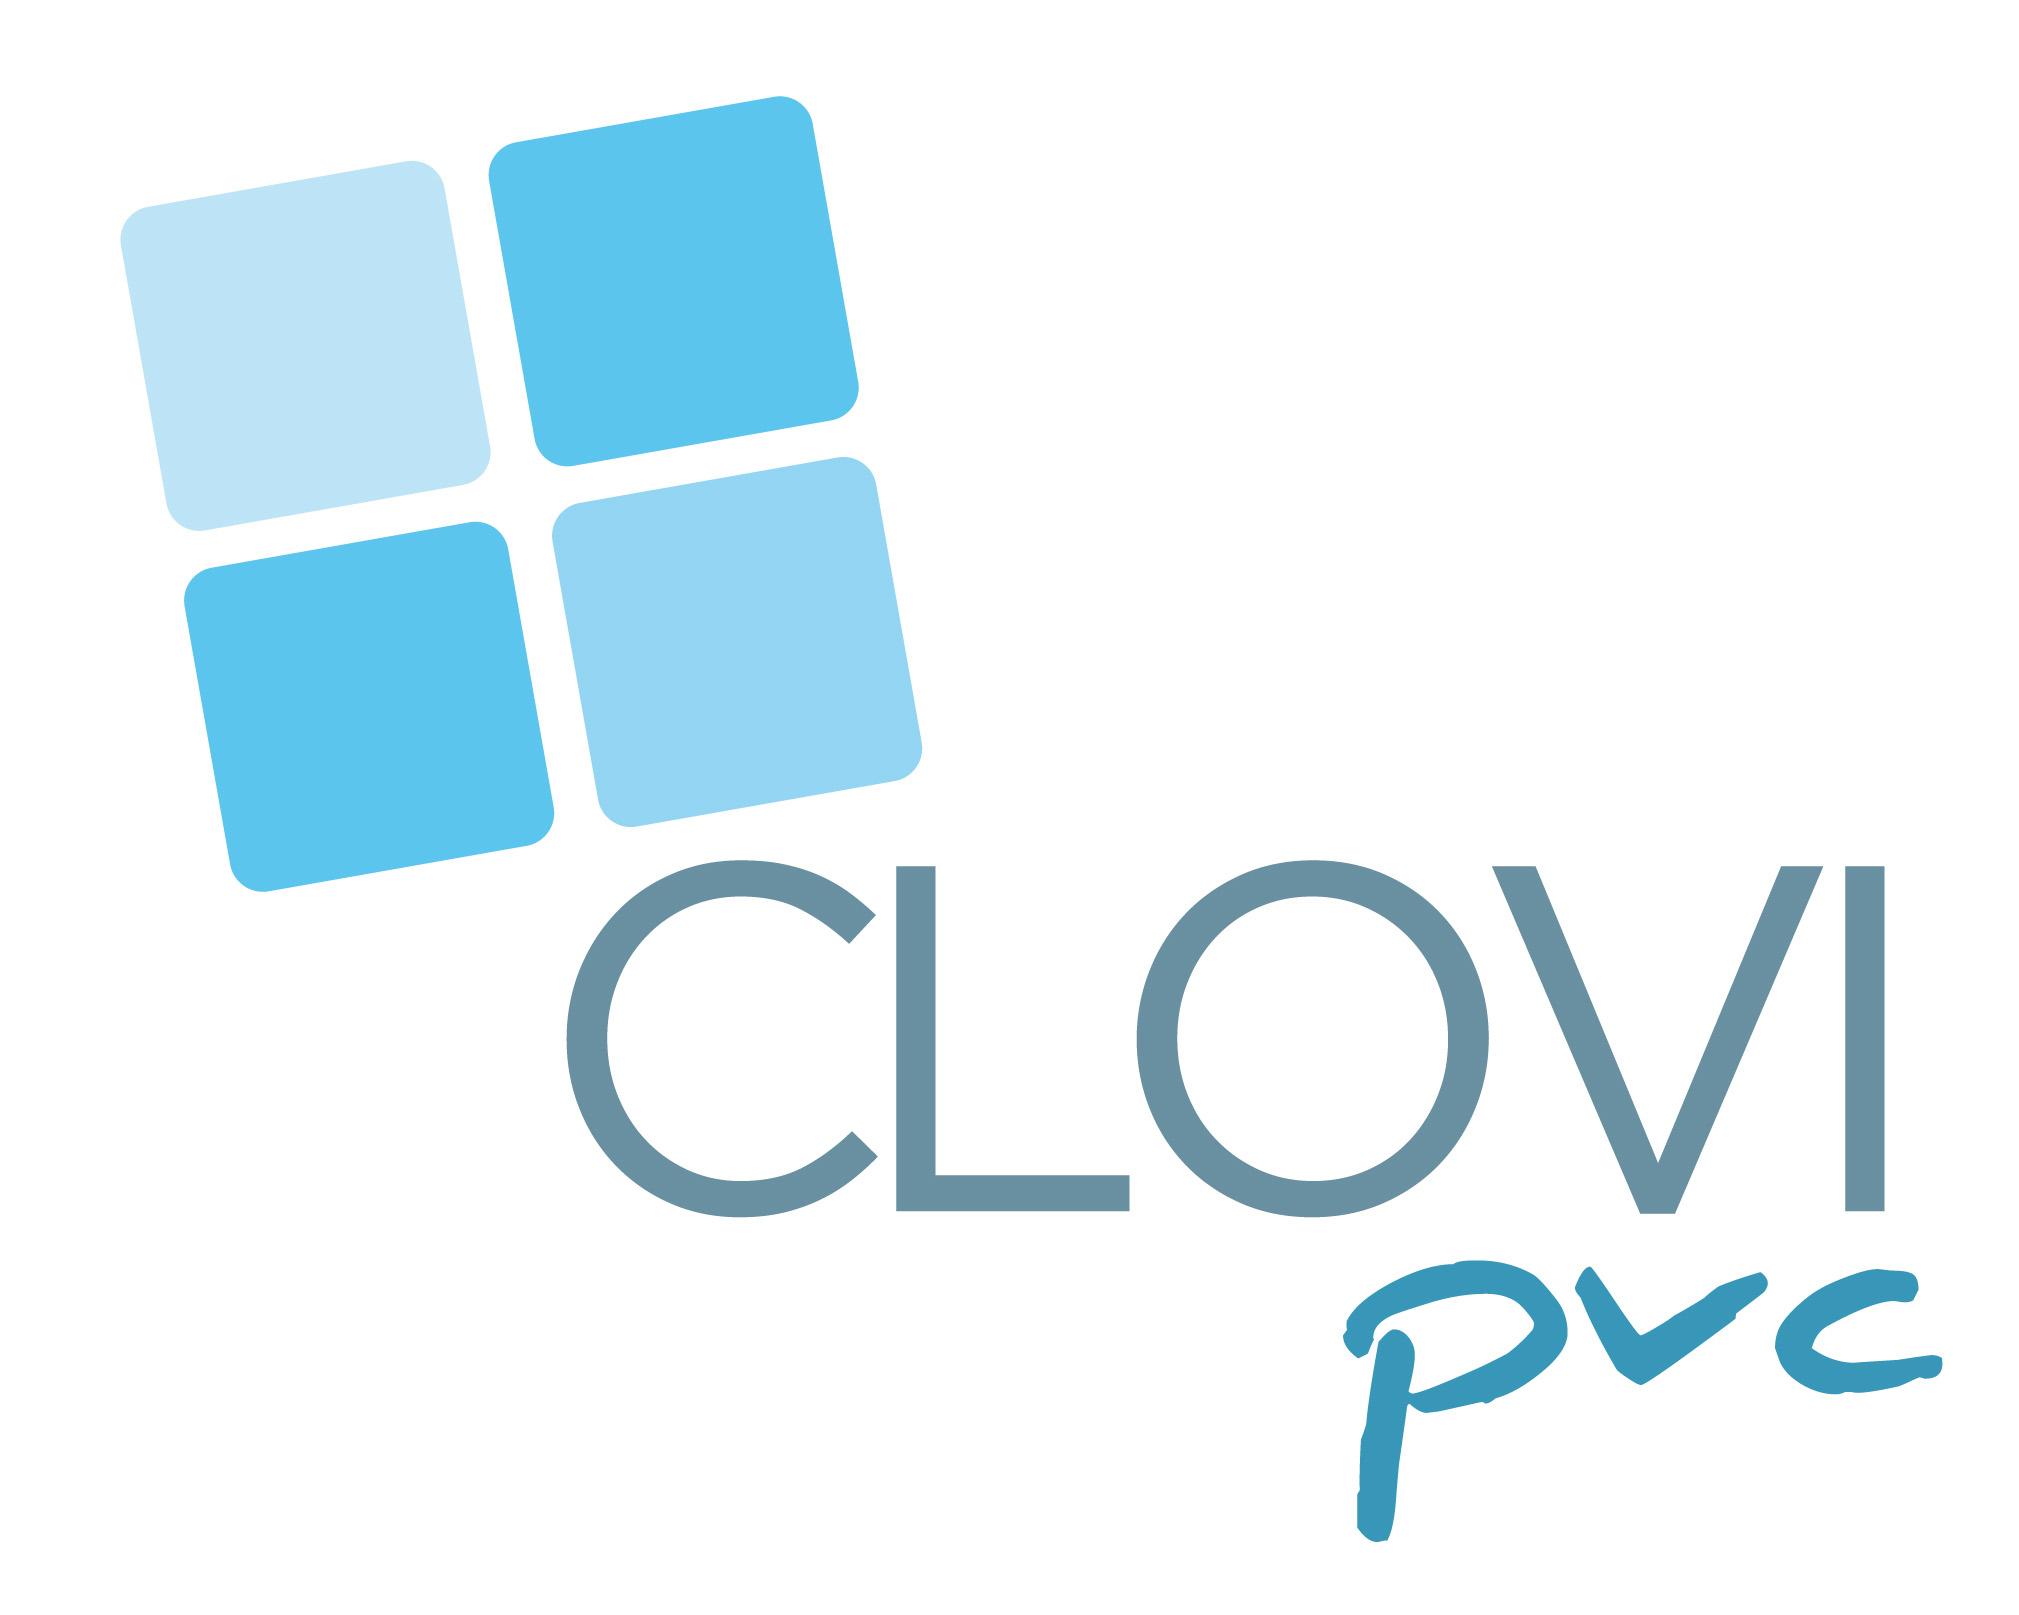 Clovi Pvc